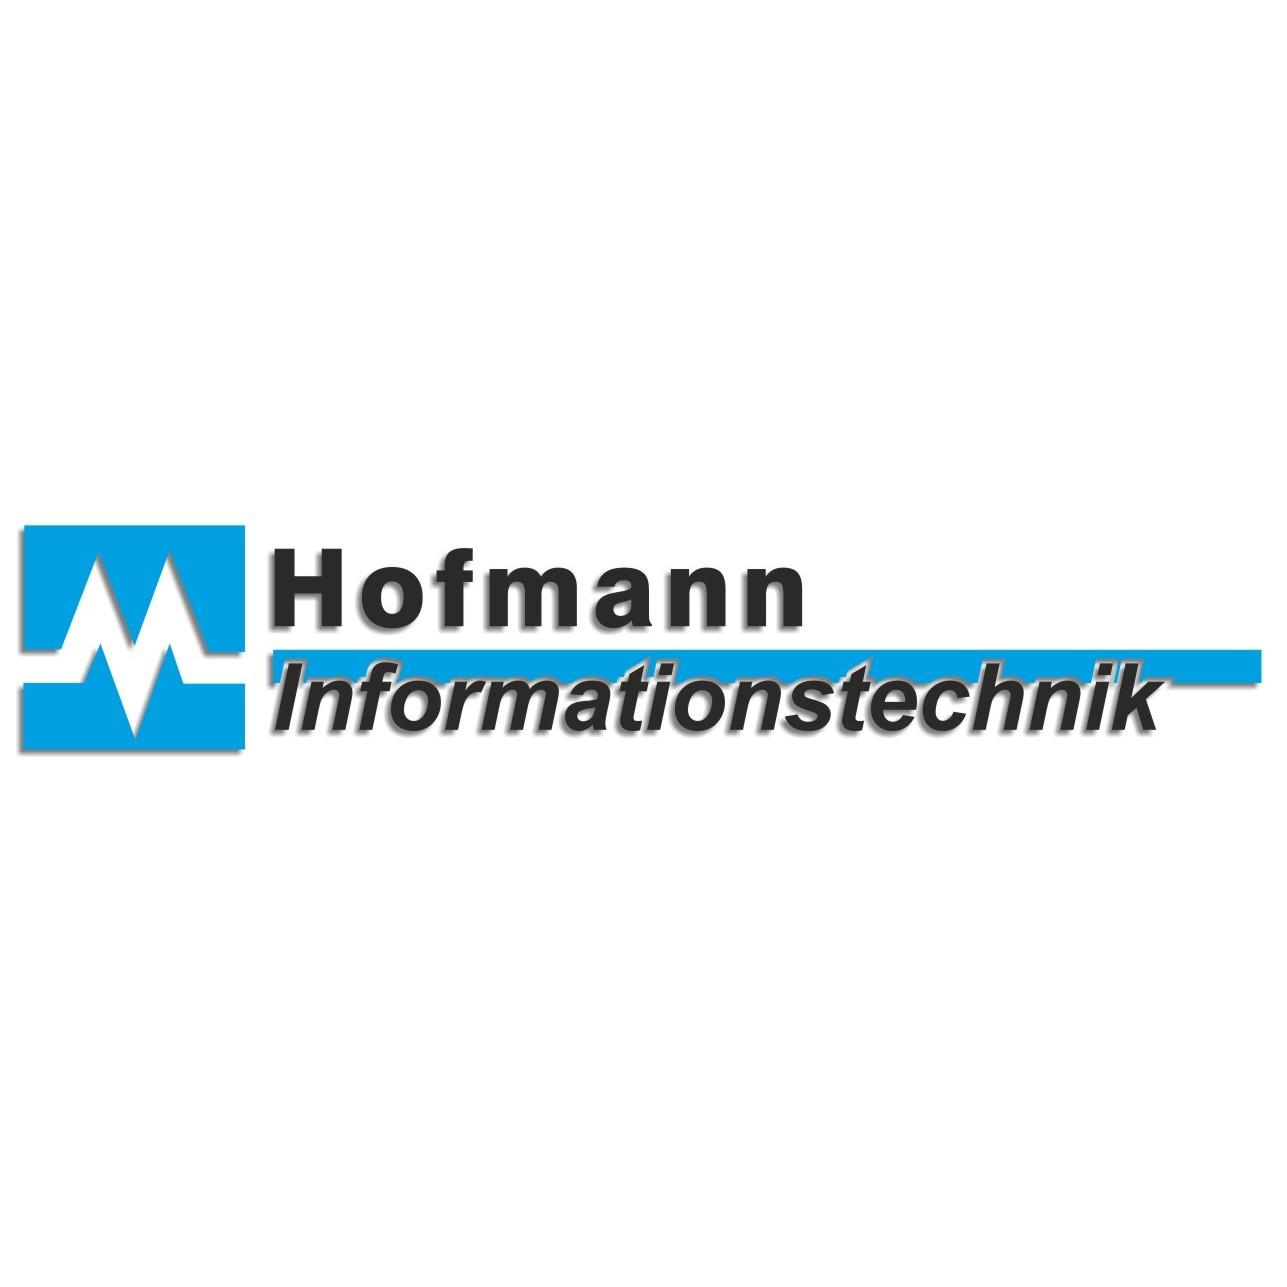 hofmann informationstechnik chemnitz 09123 yellowmap. Black Bedroom Furniture Sets. Home Design Ideas